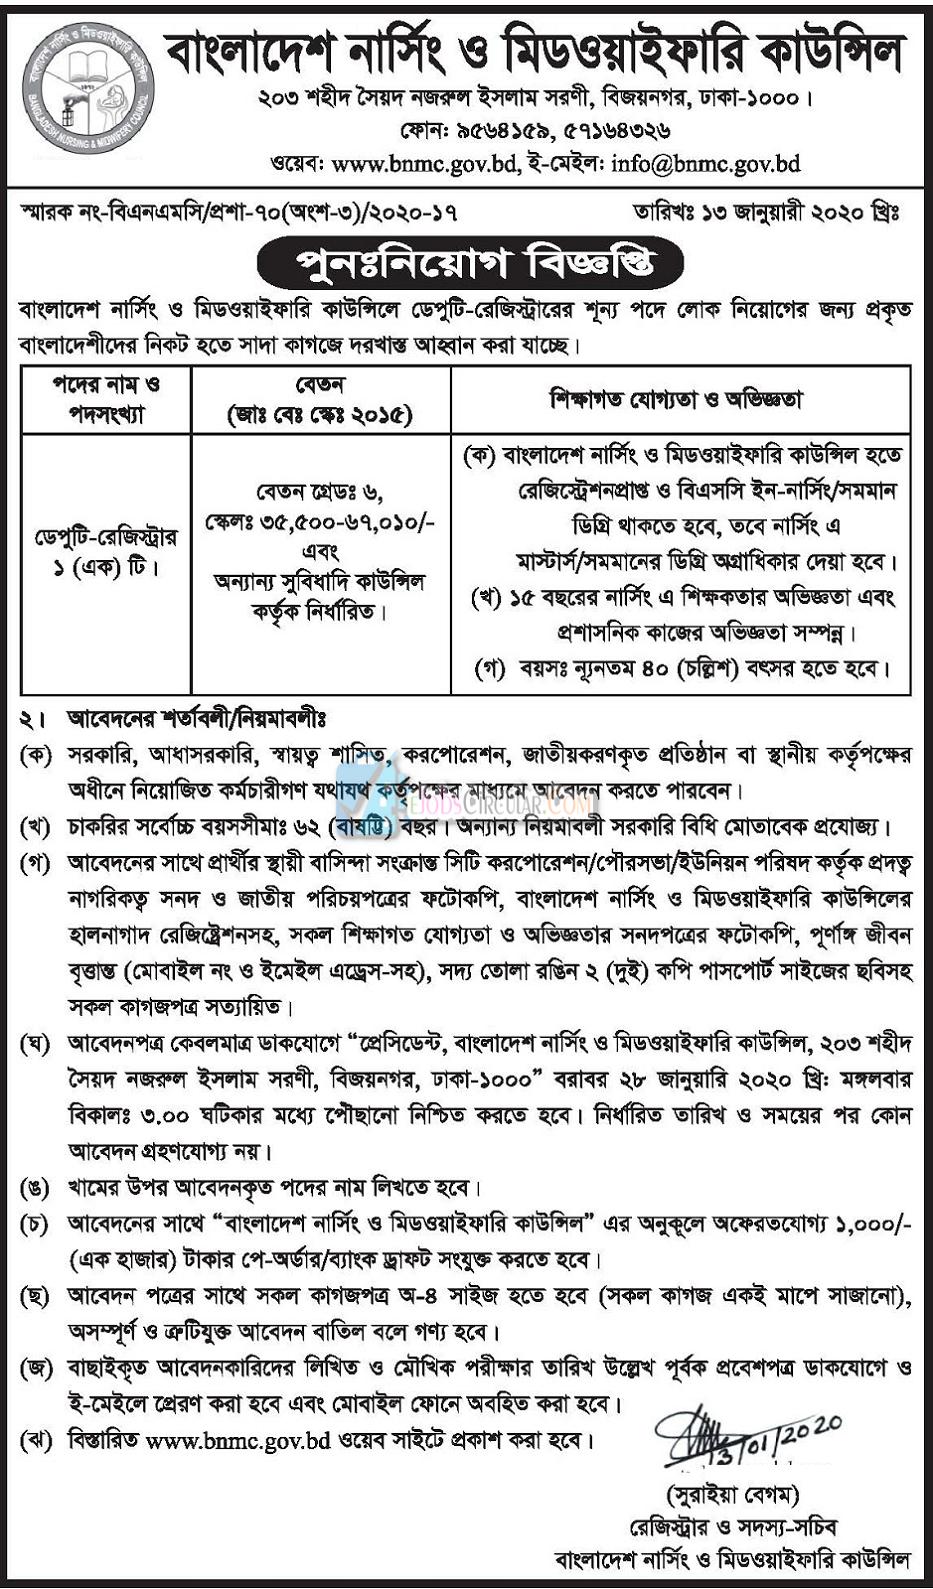 Bangladesh Nursing and Midwifery Council (BNMC) Job Circular 2020